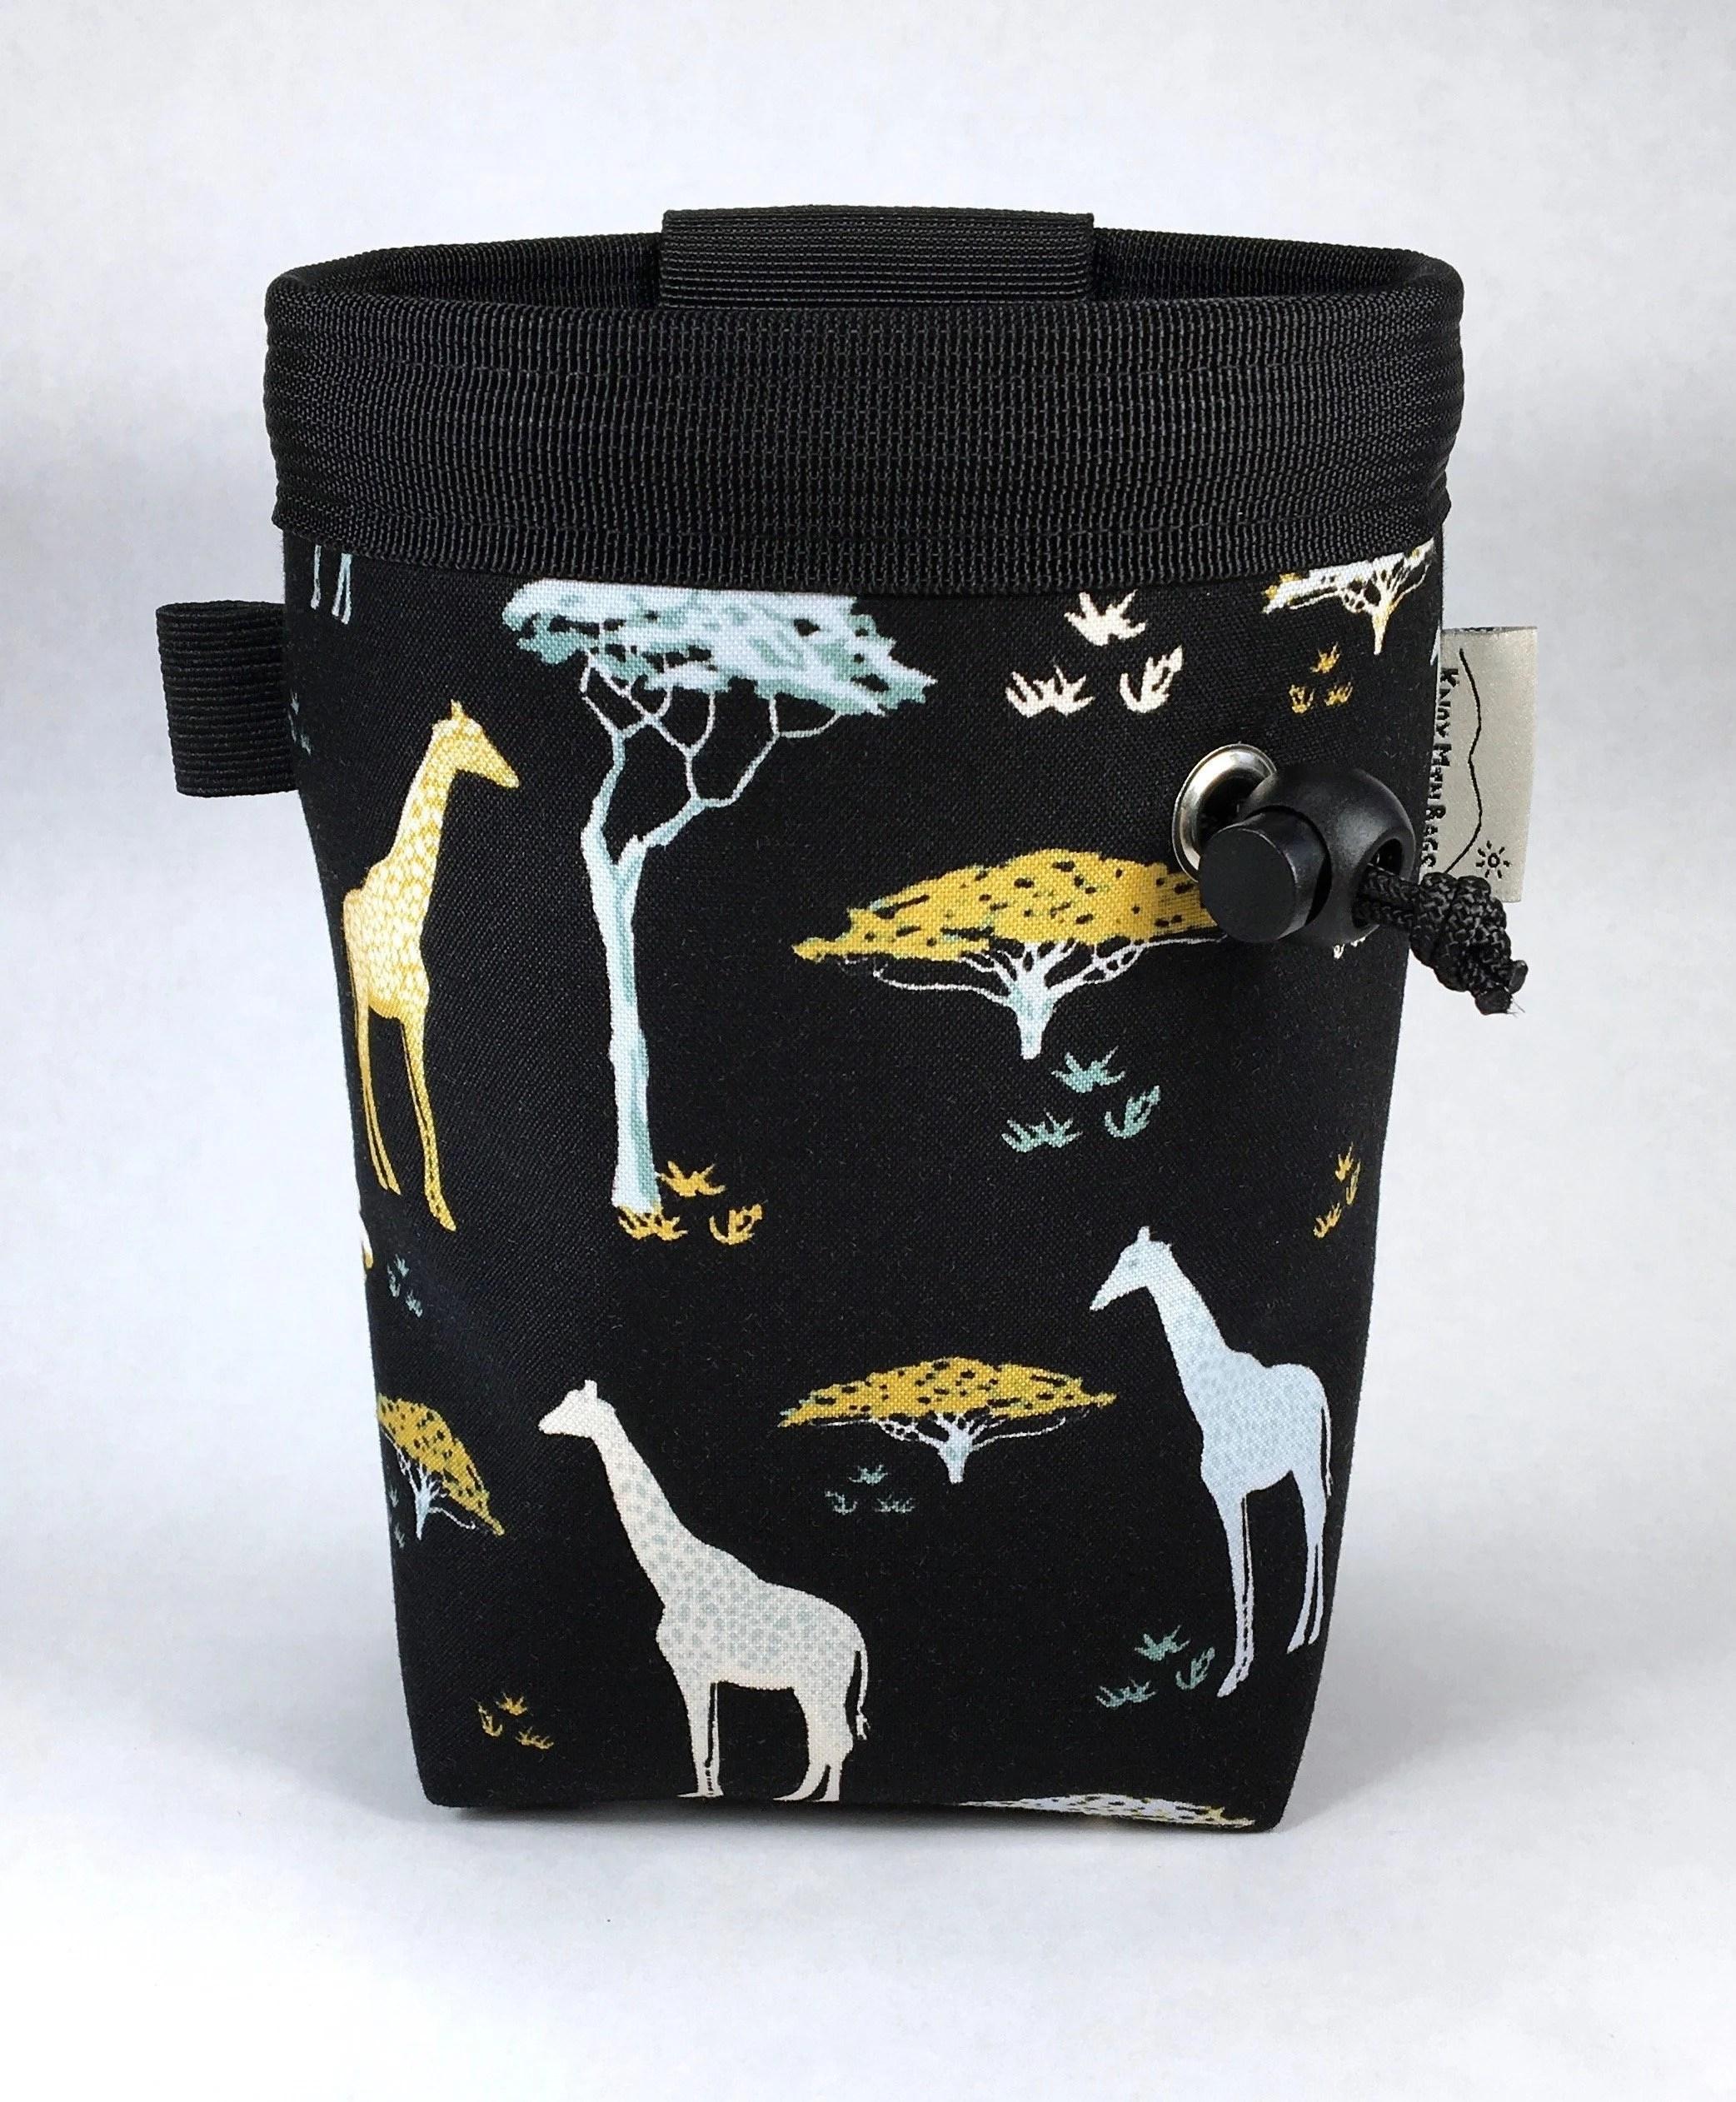 chalk bag giraffes and